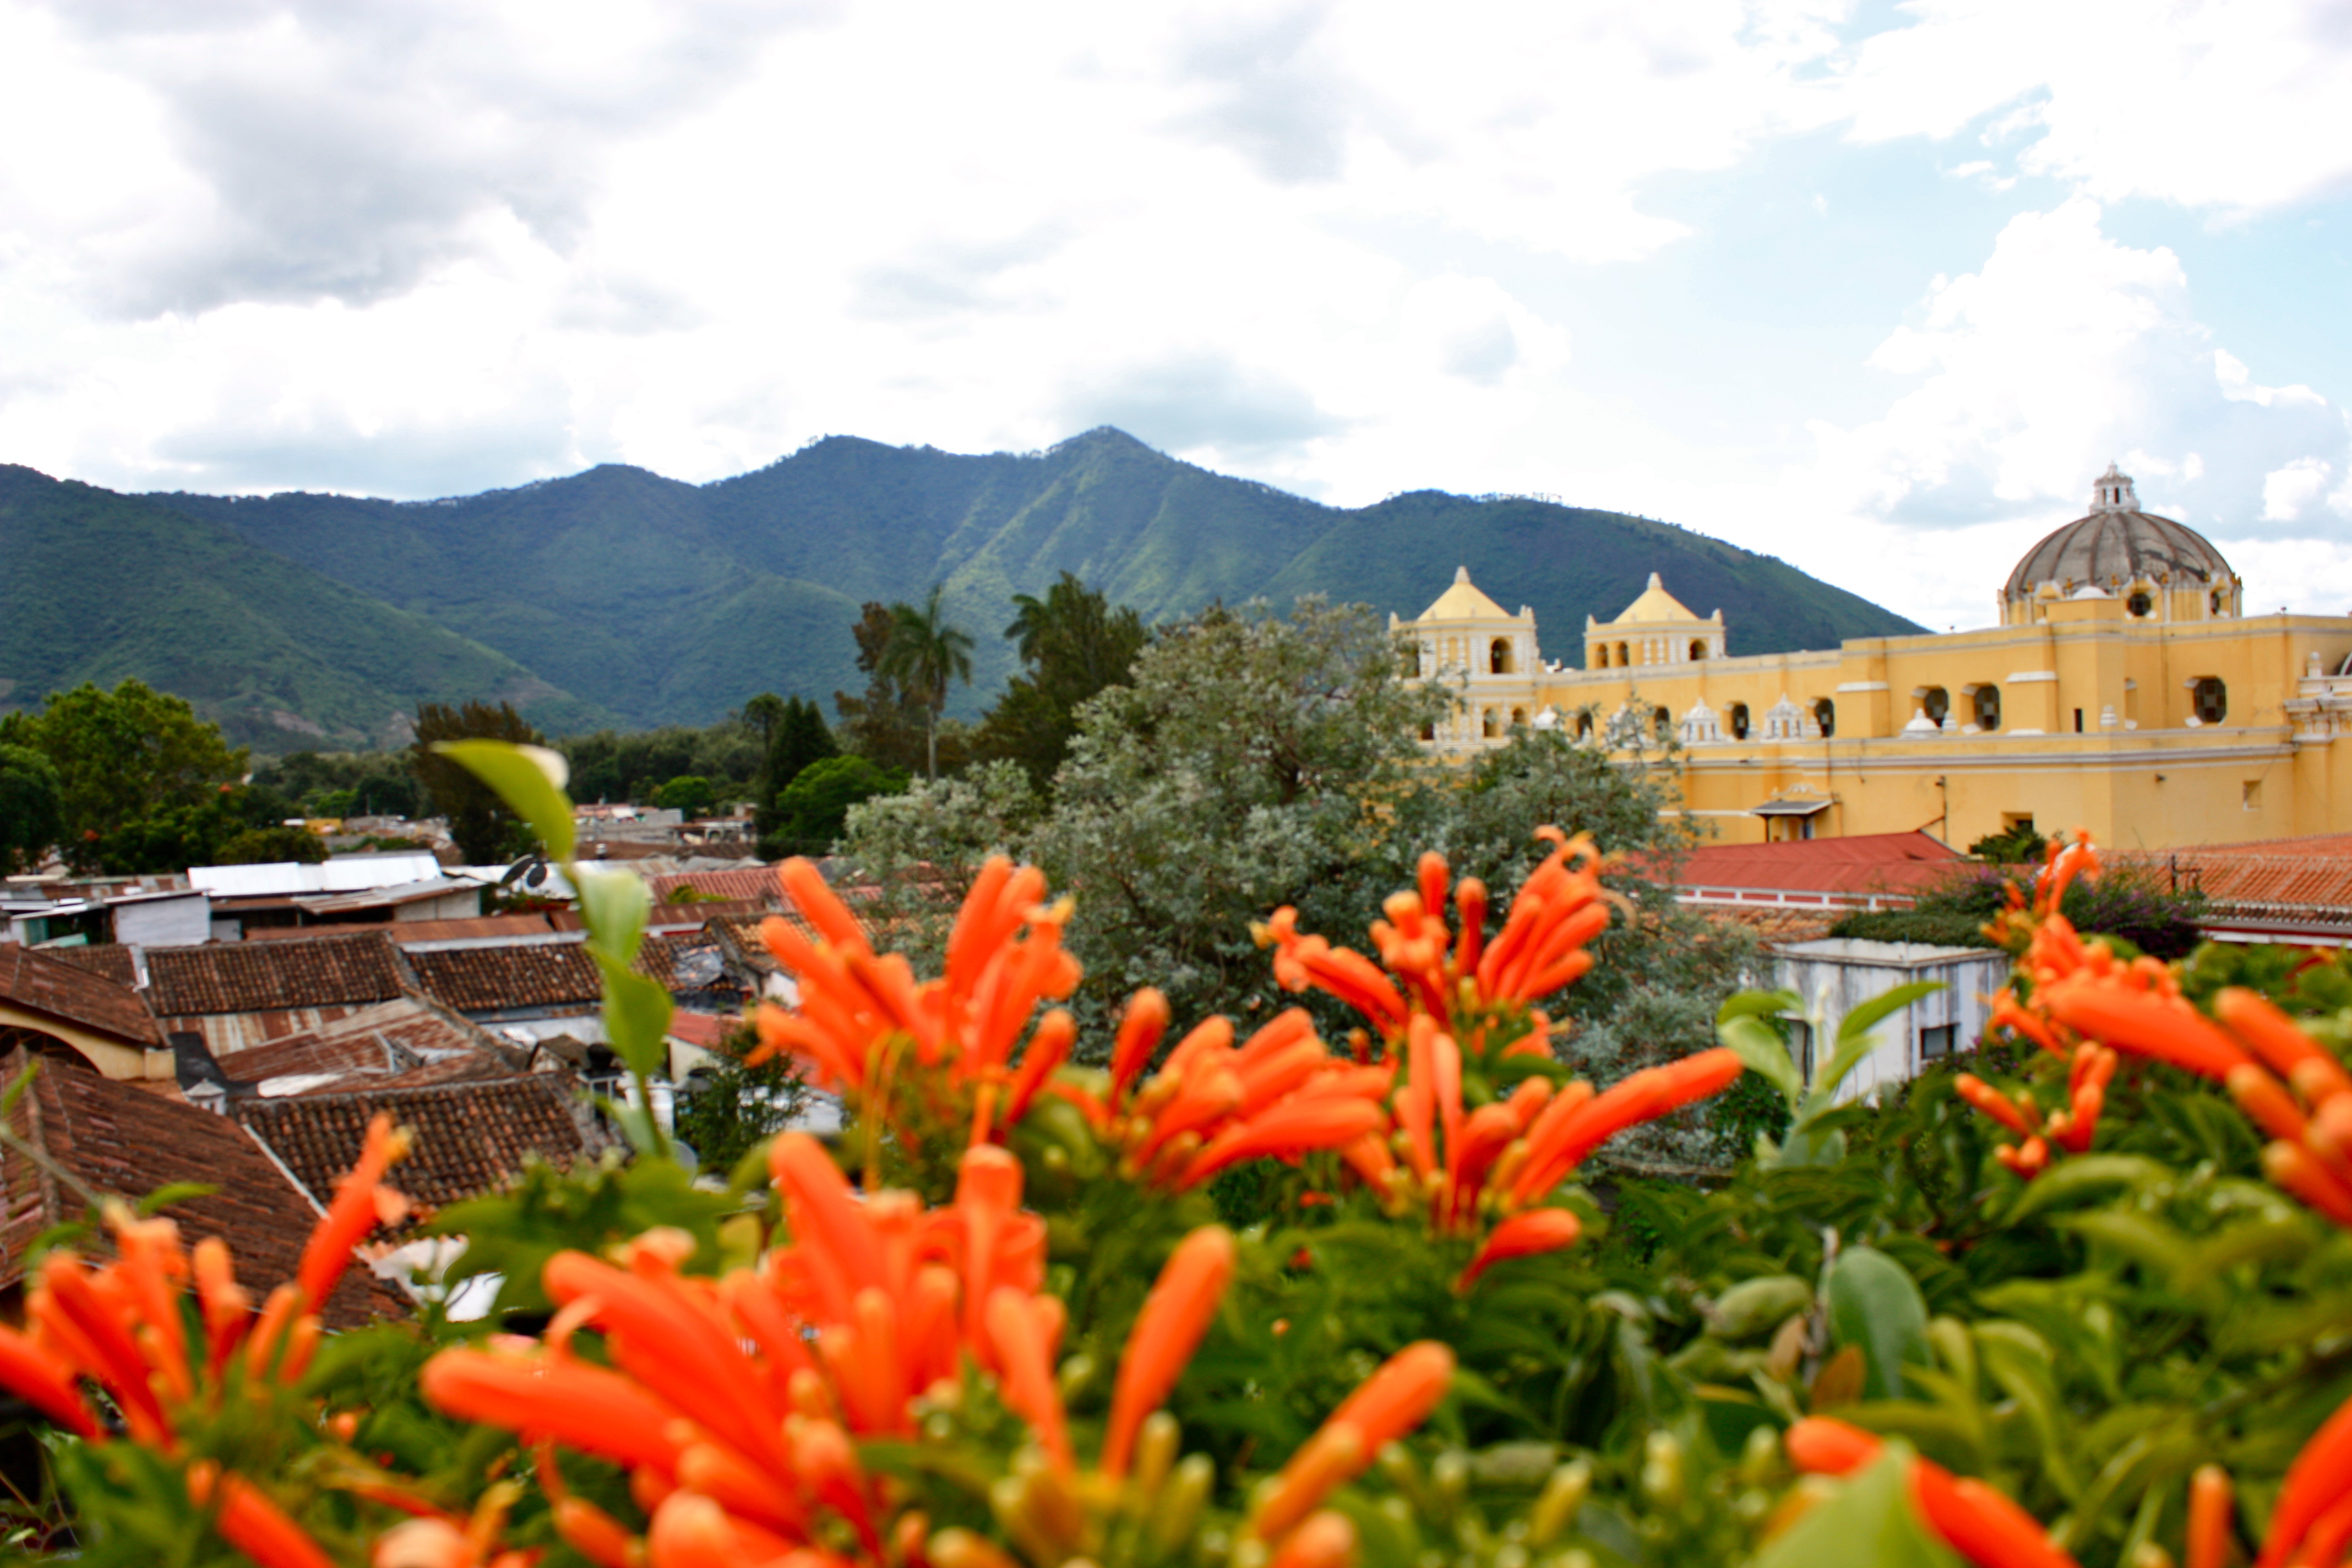 HOTELES Y RESTAURANTES EN ANTIGUA GUATEMALA  Pilar Munne